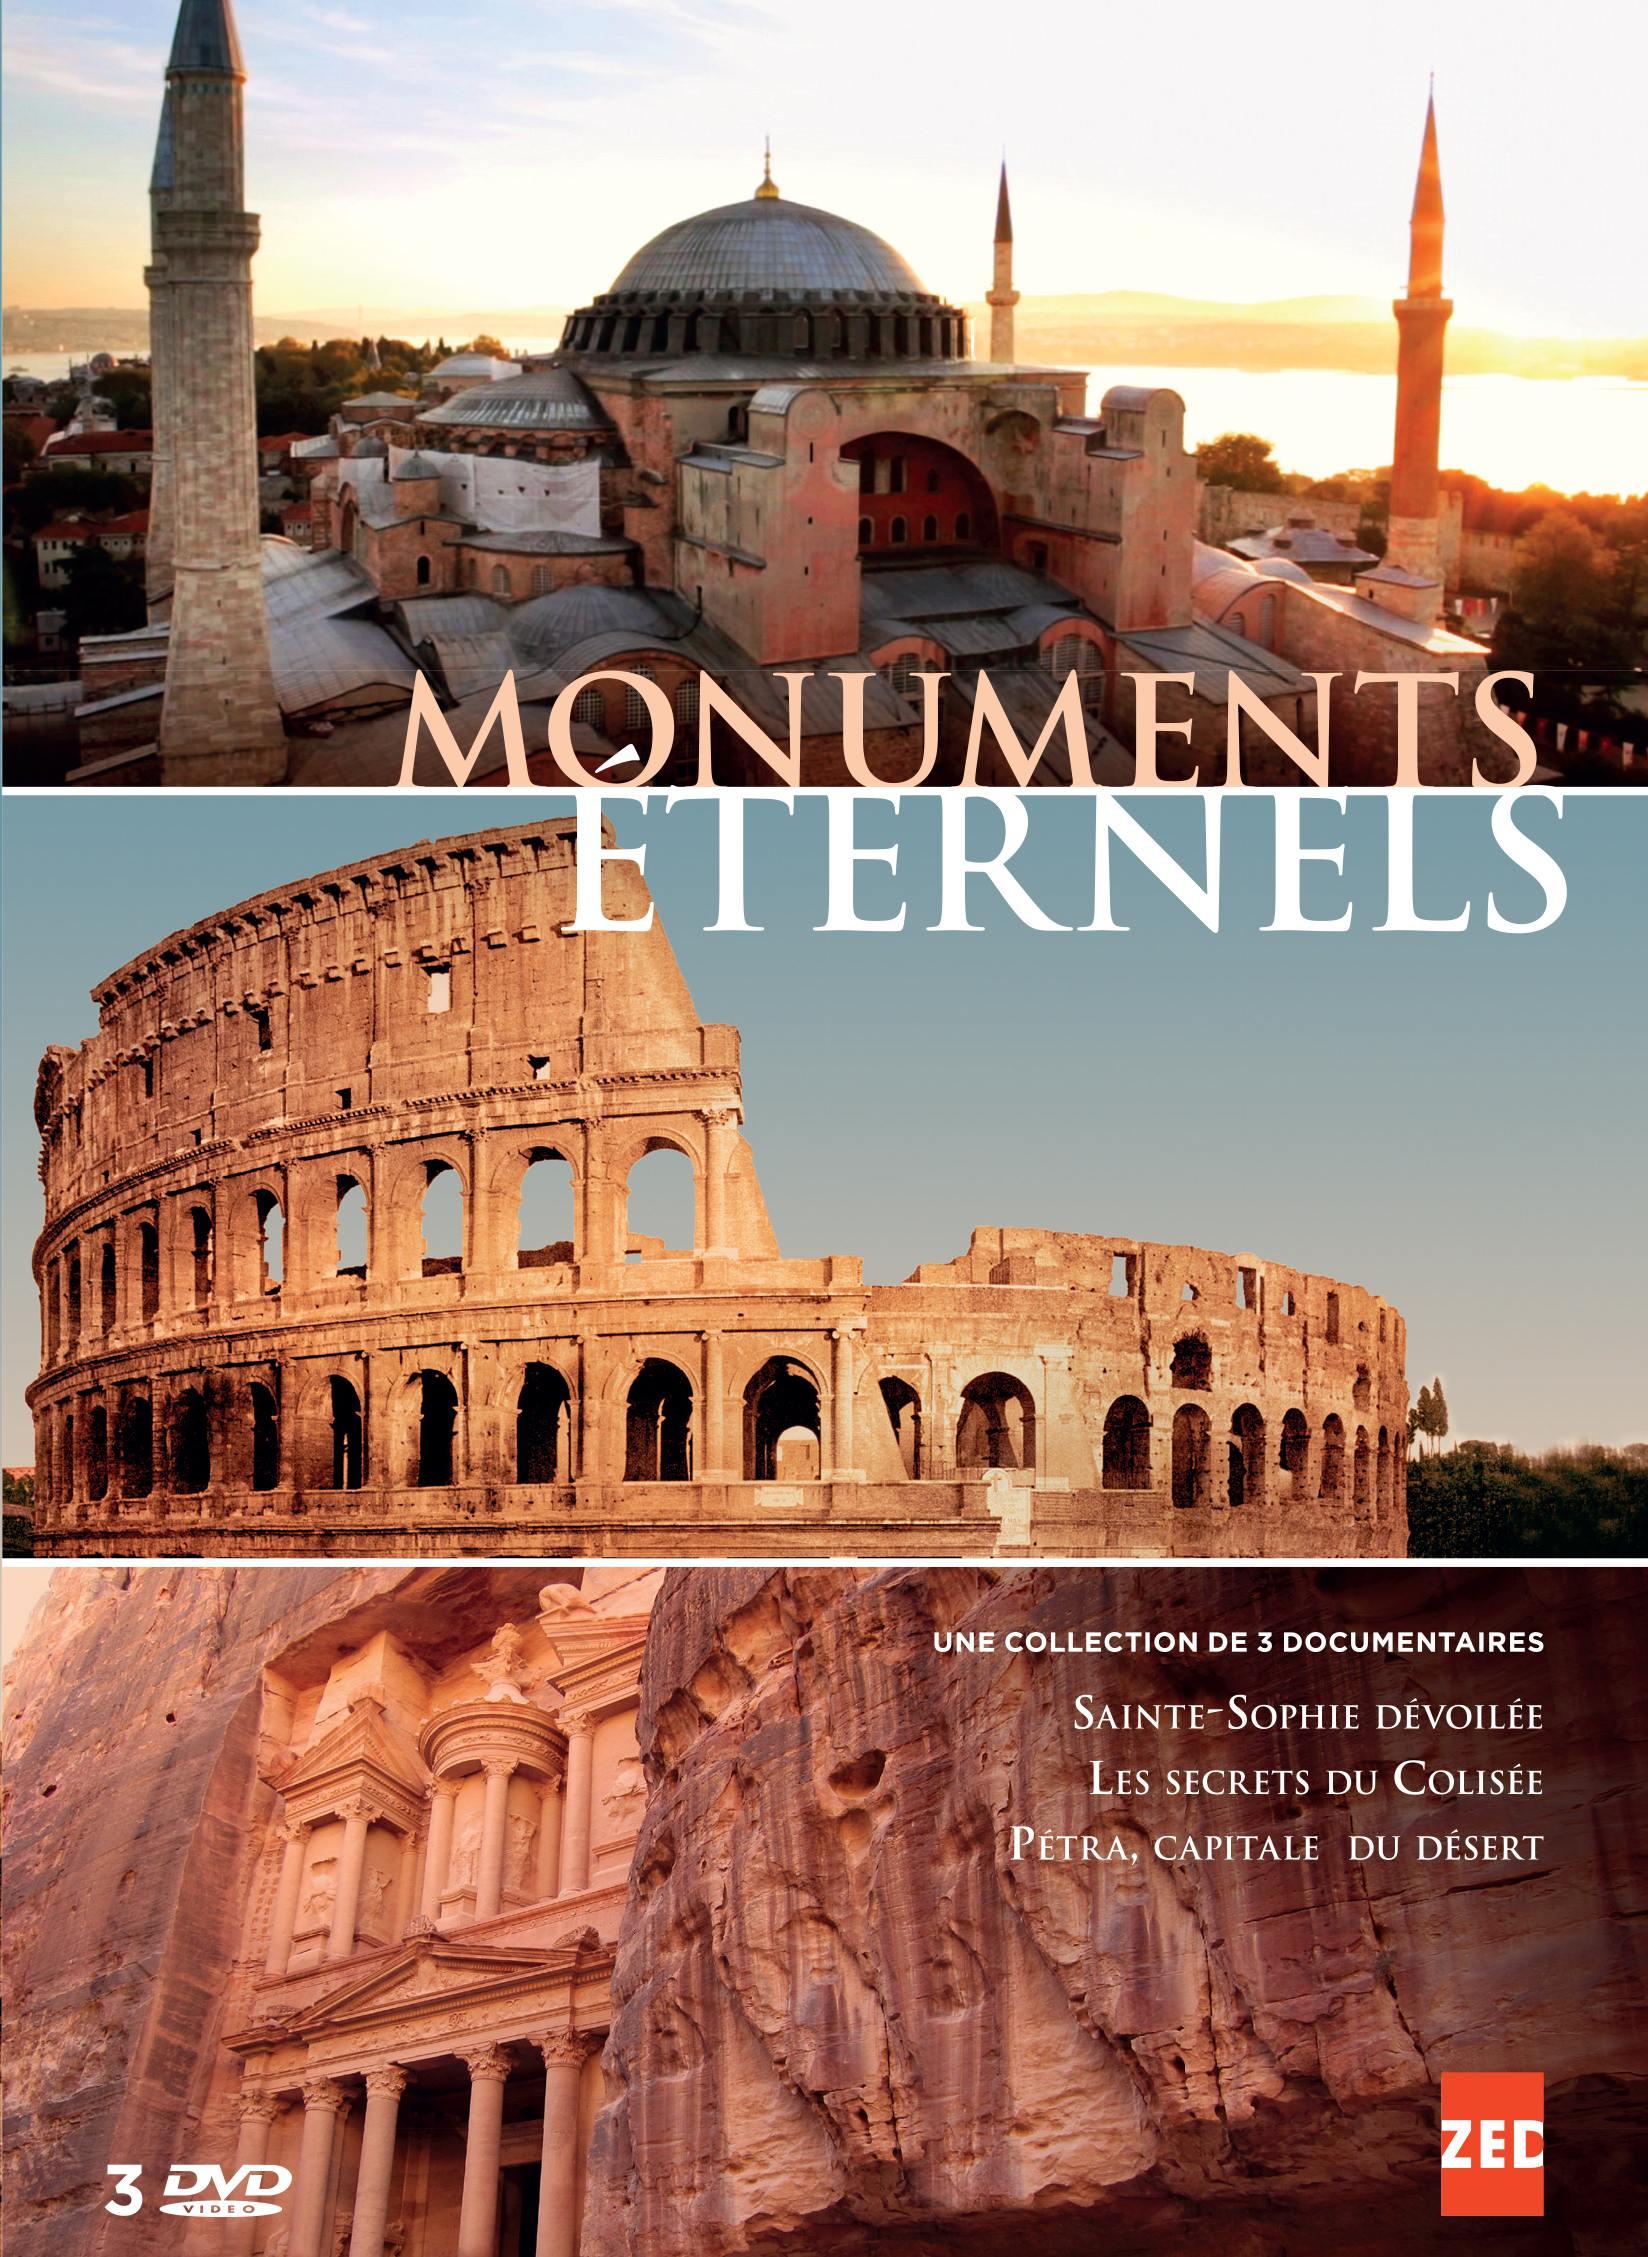 Monuments eternels - 3 dvd